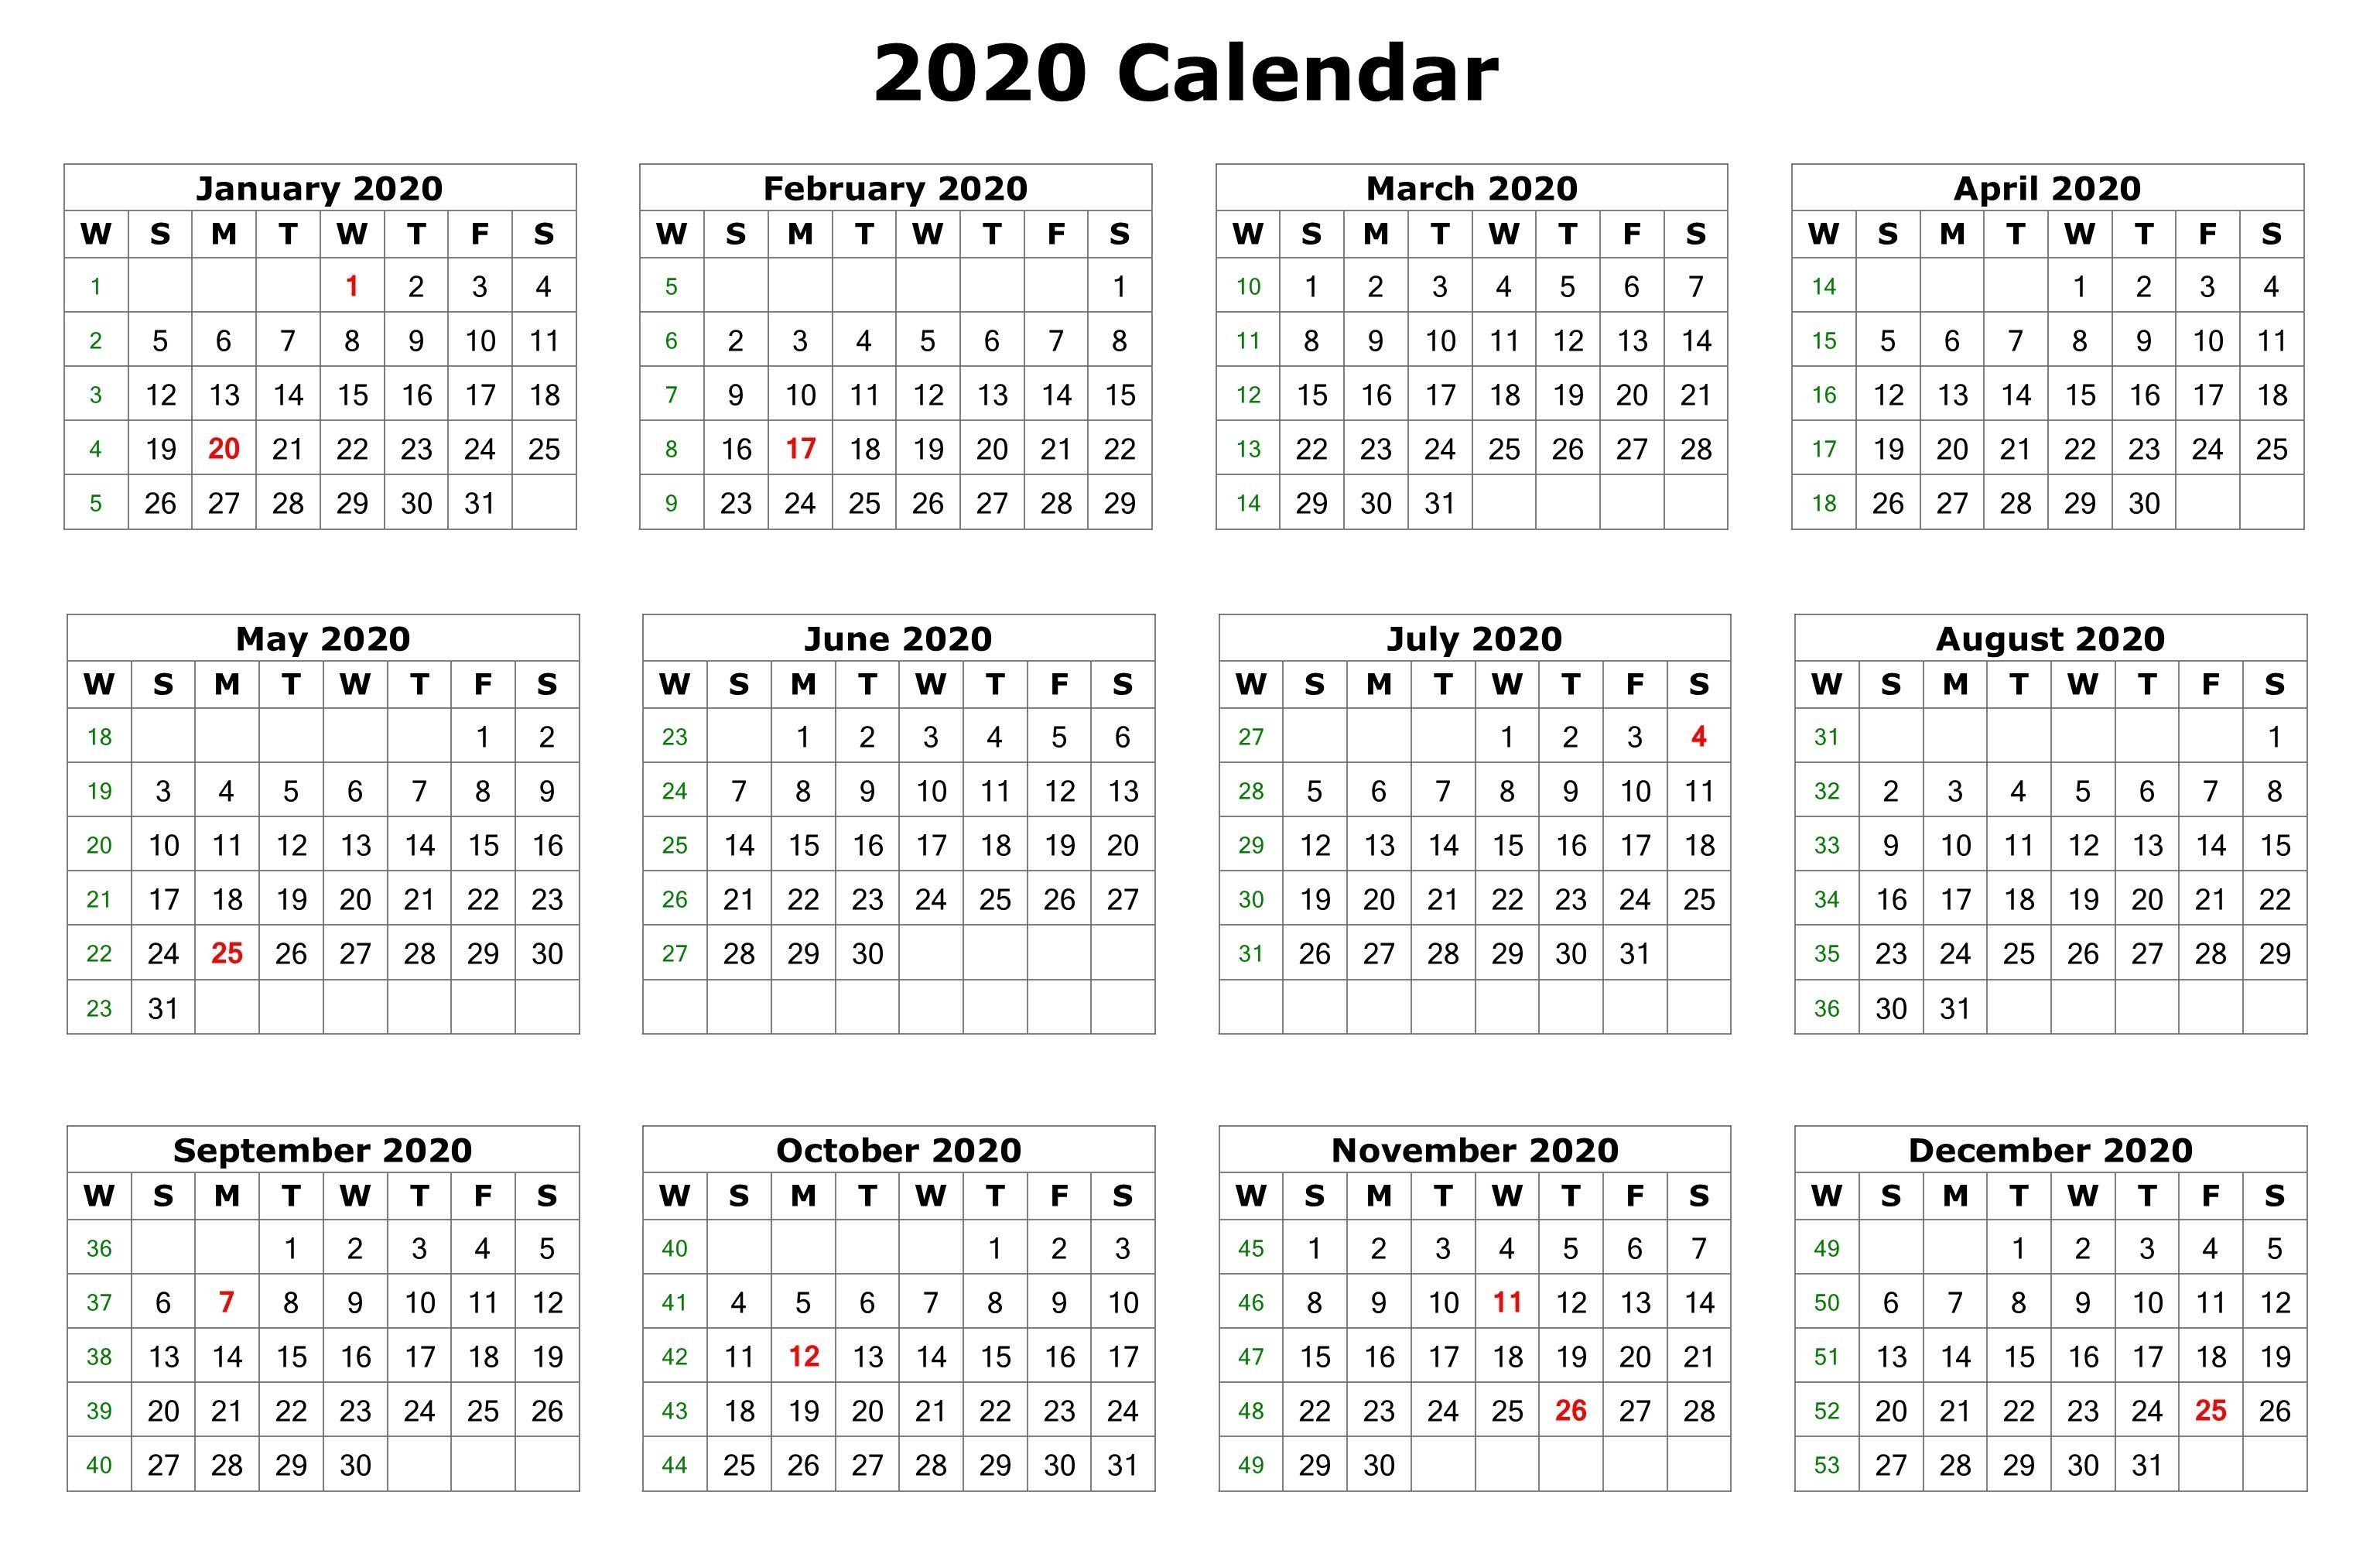 2020 12 Months Calendar Printable | 12 Month Calendar, 2020